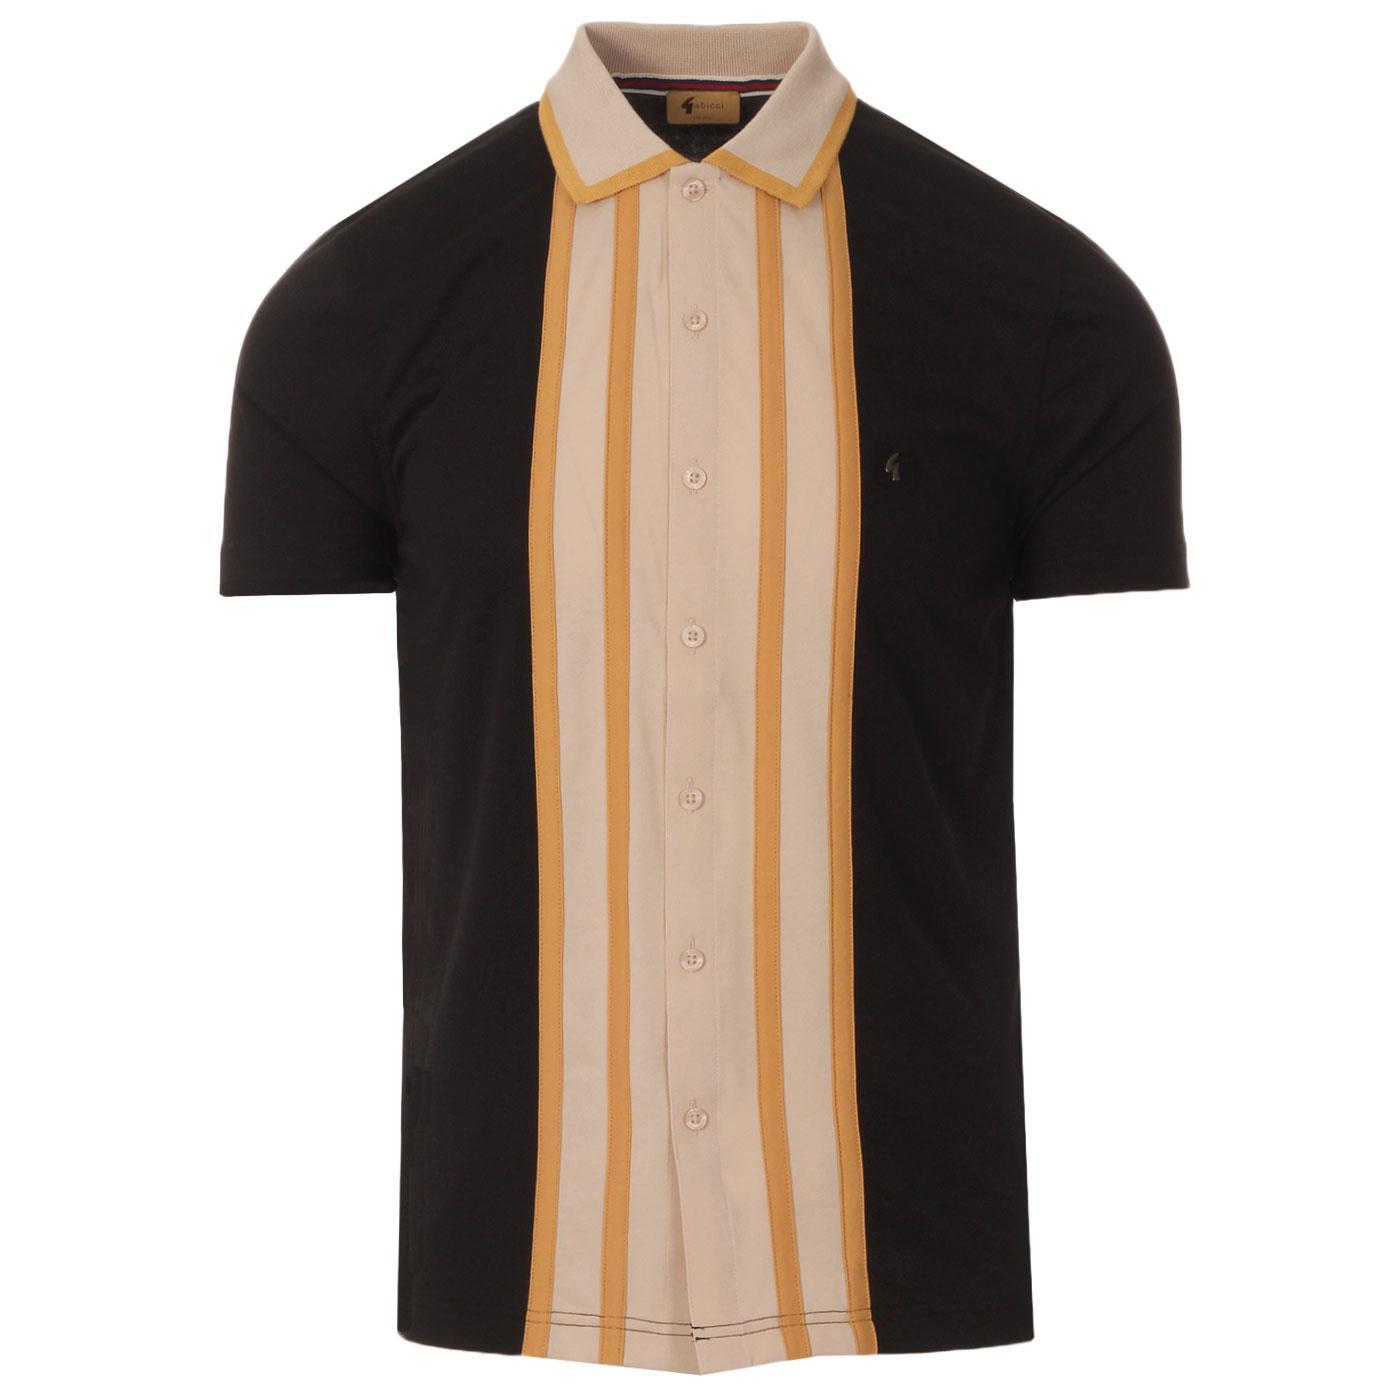 Statham GABICCI VINTAGE Retro Mod Jersey Shirt B